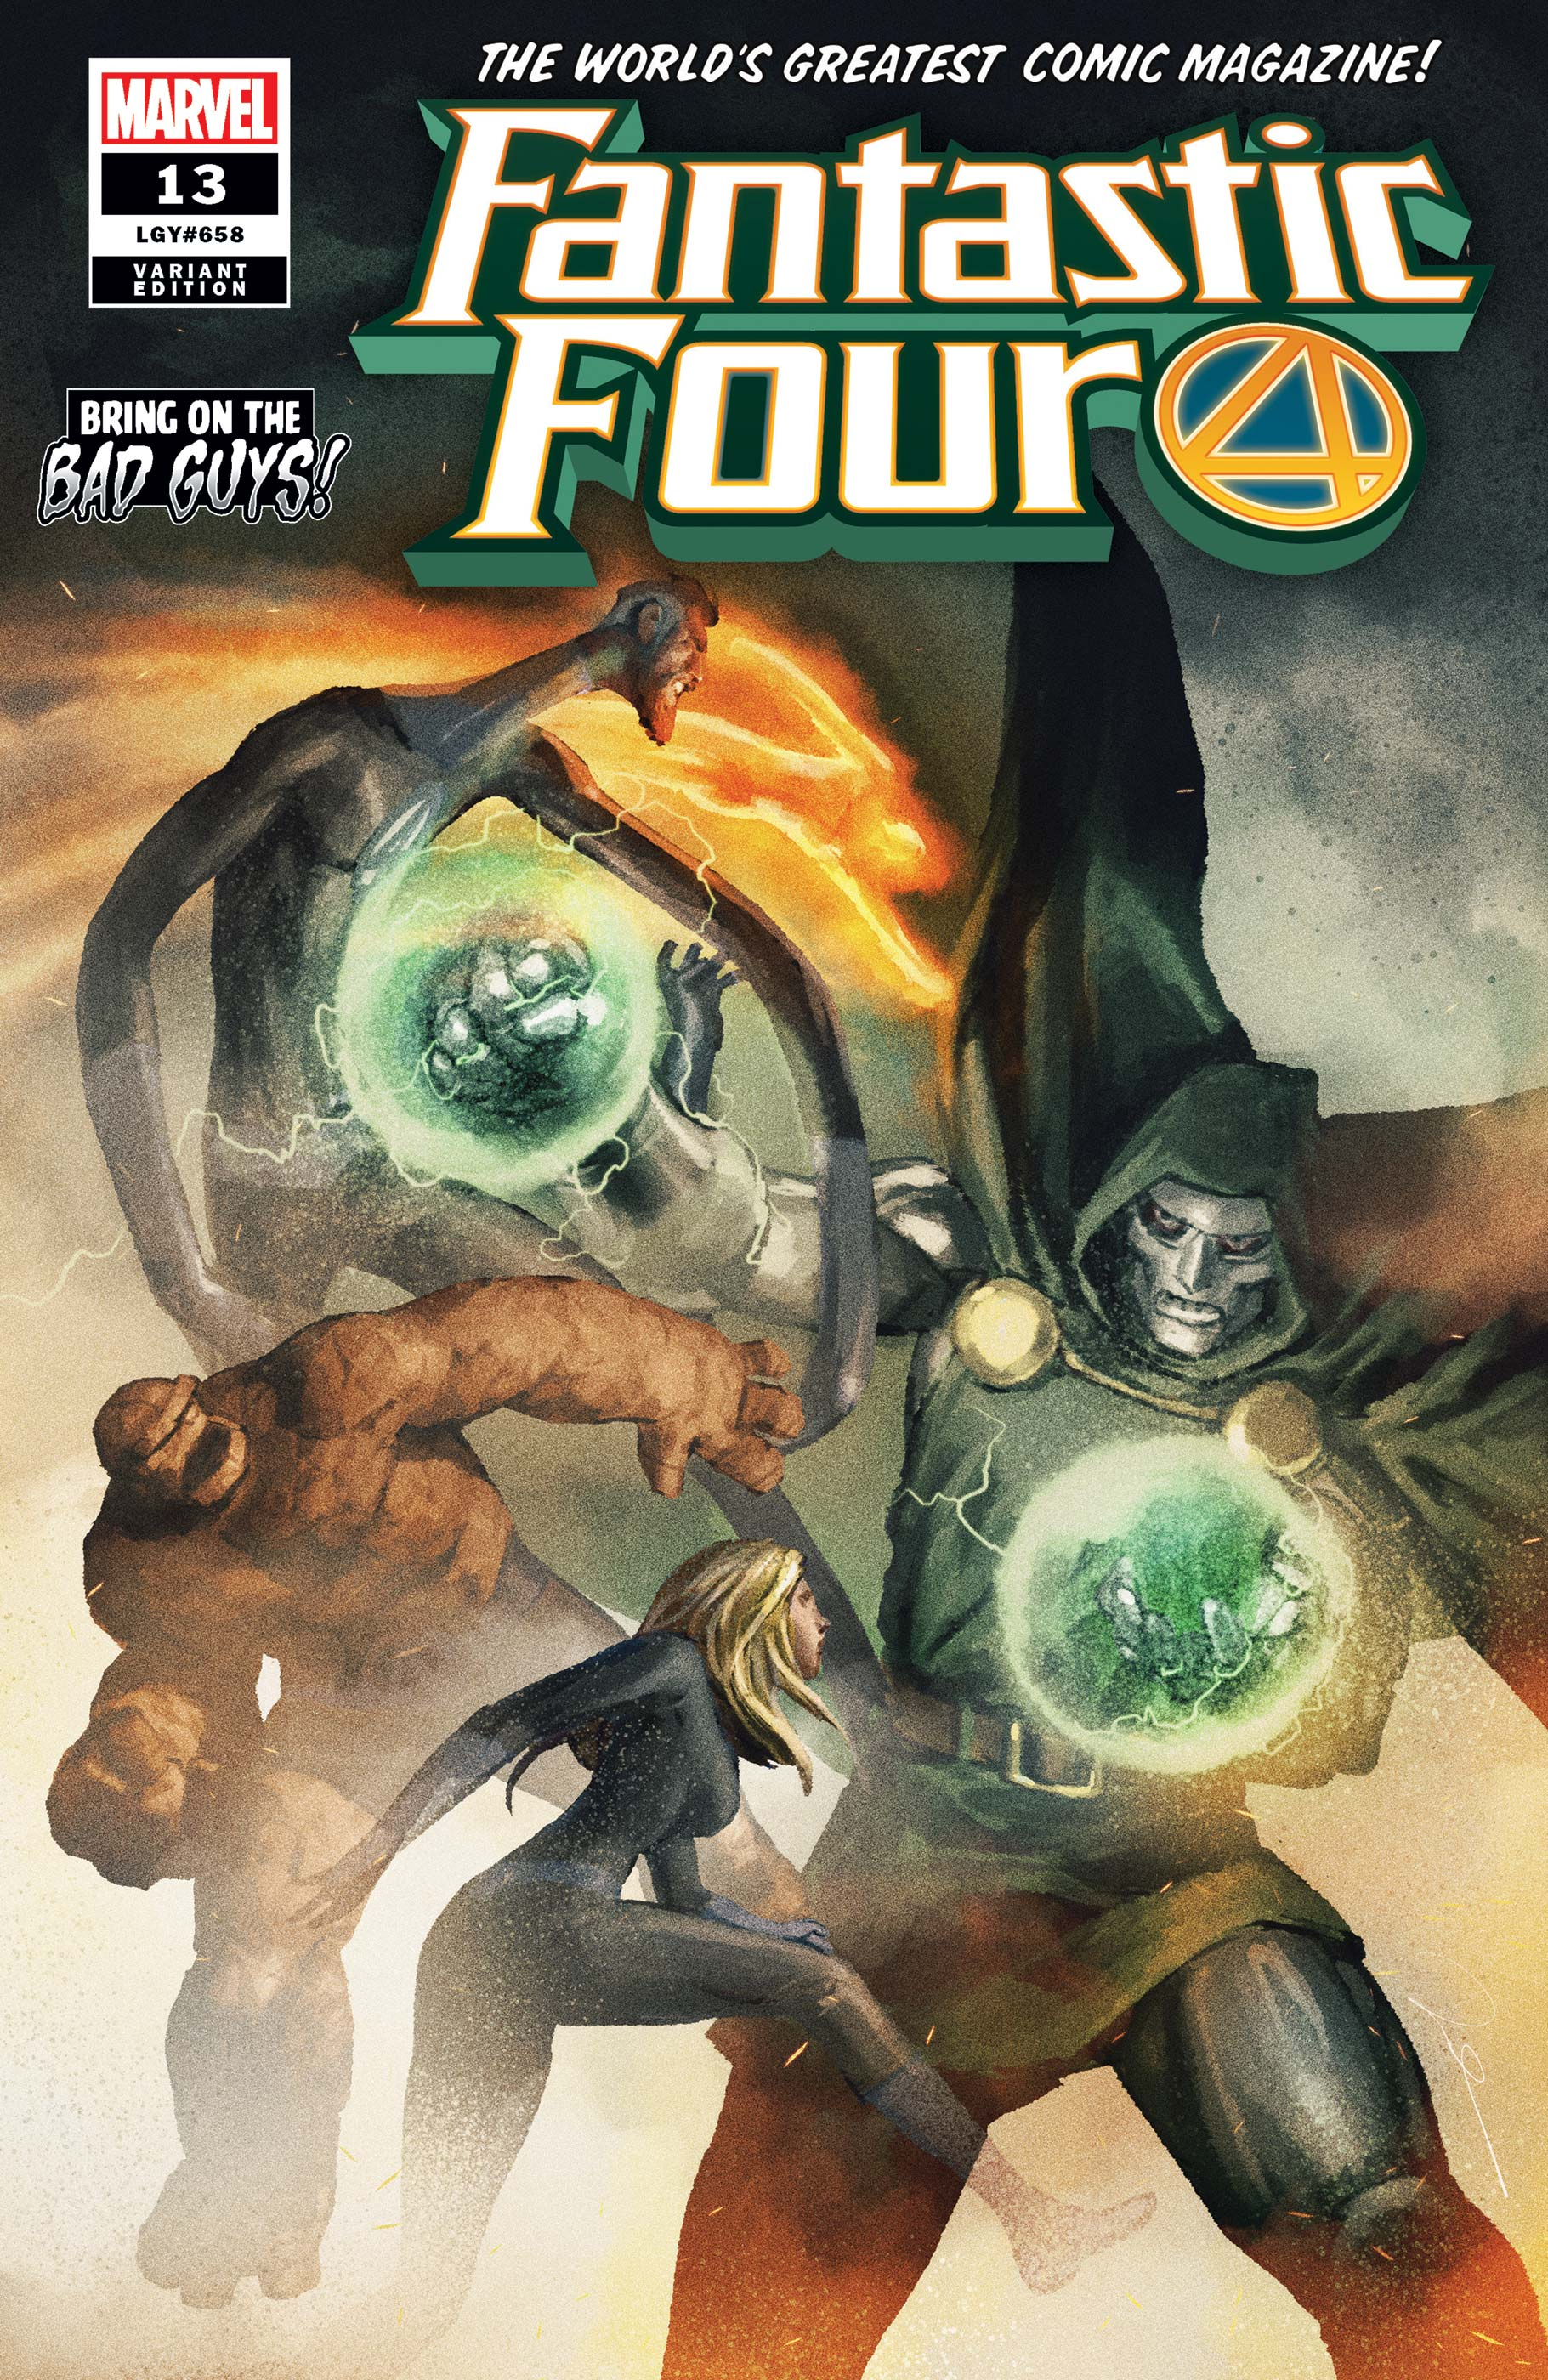 Fantastic Four (2018) #13 (Variant)